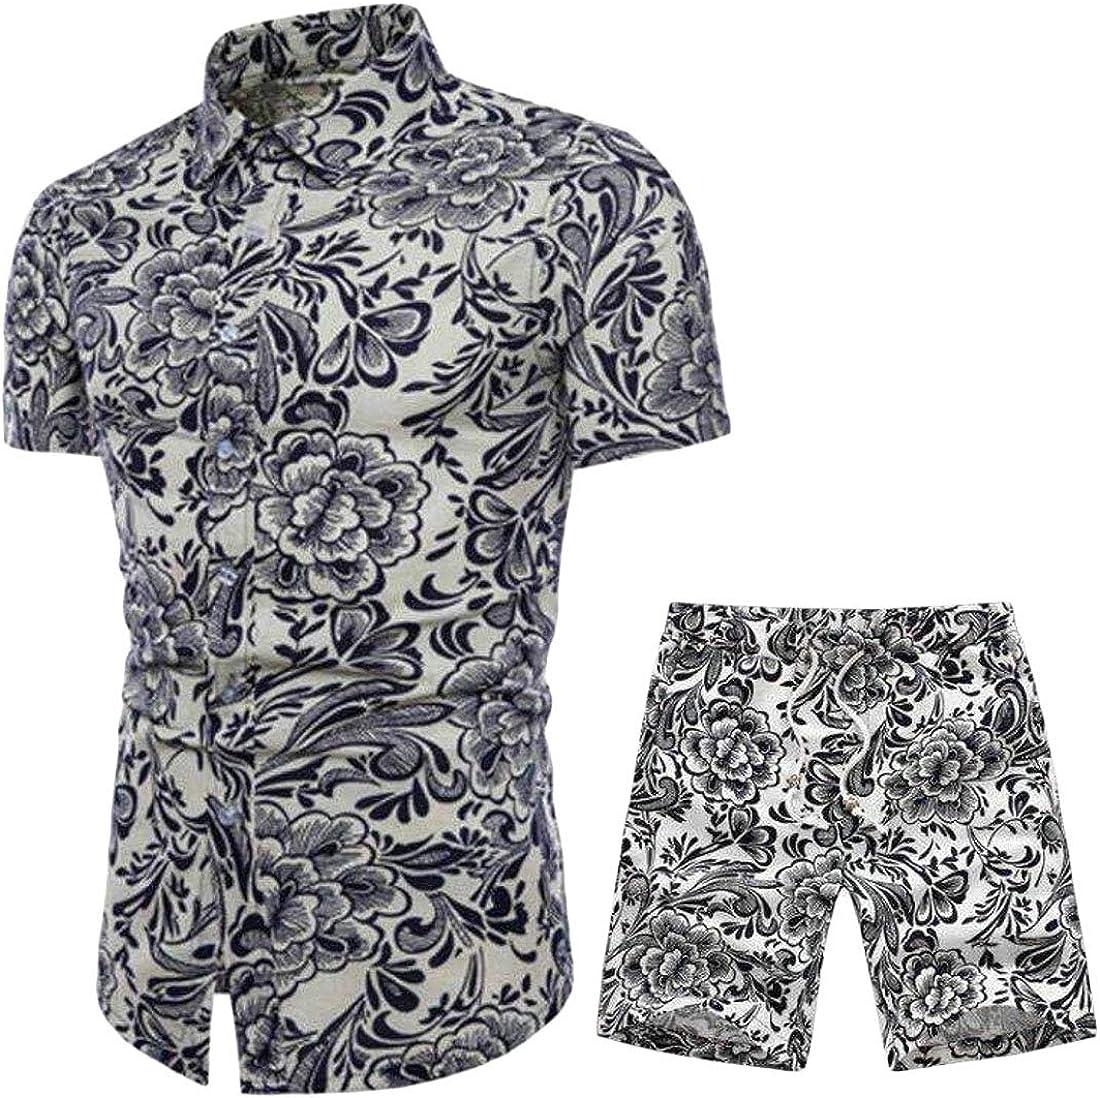 ARTFFEL Men Short Sleeve Button Up Floral Print Slim Fit Plus Size Shirts /& Beach Shorts Outfits